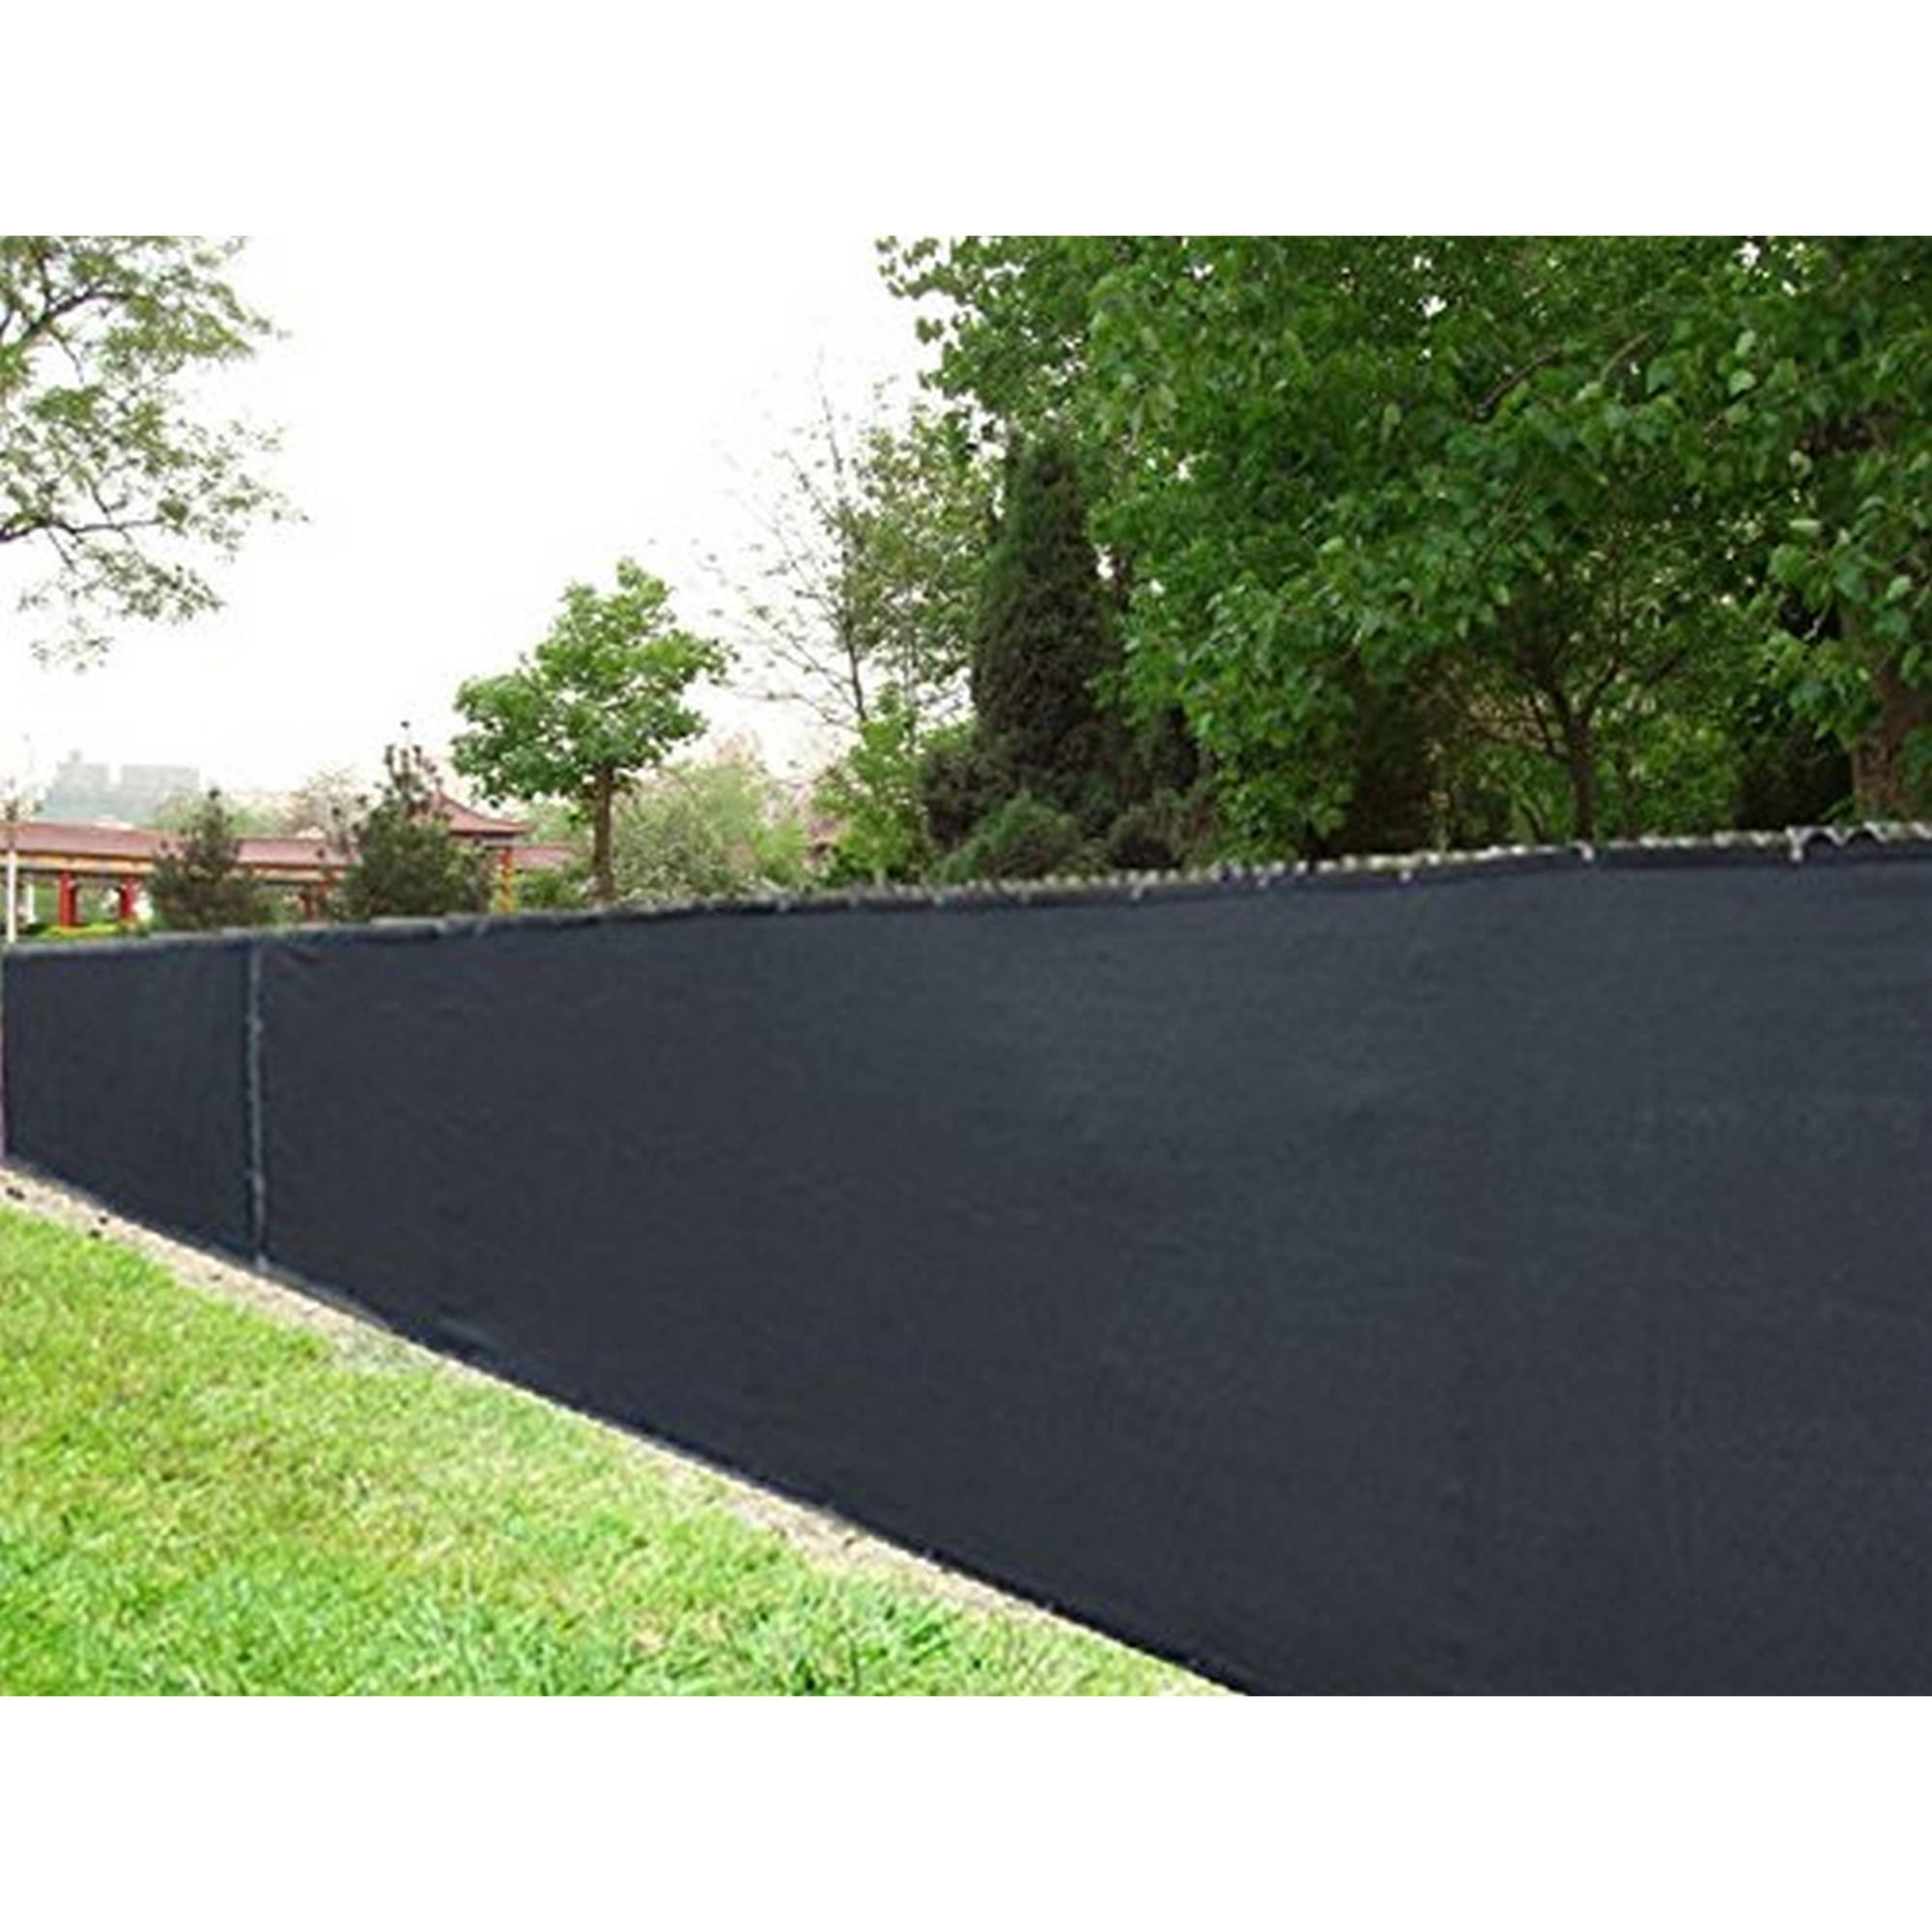 Aleko 6 x 150 aluminum eye black fence privacy screen outdoor backyard fencing privacy